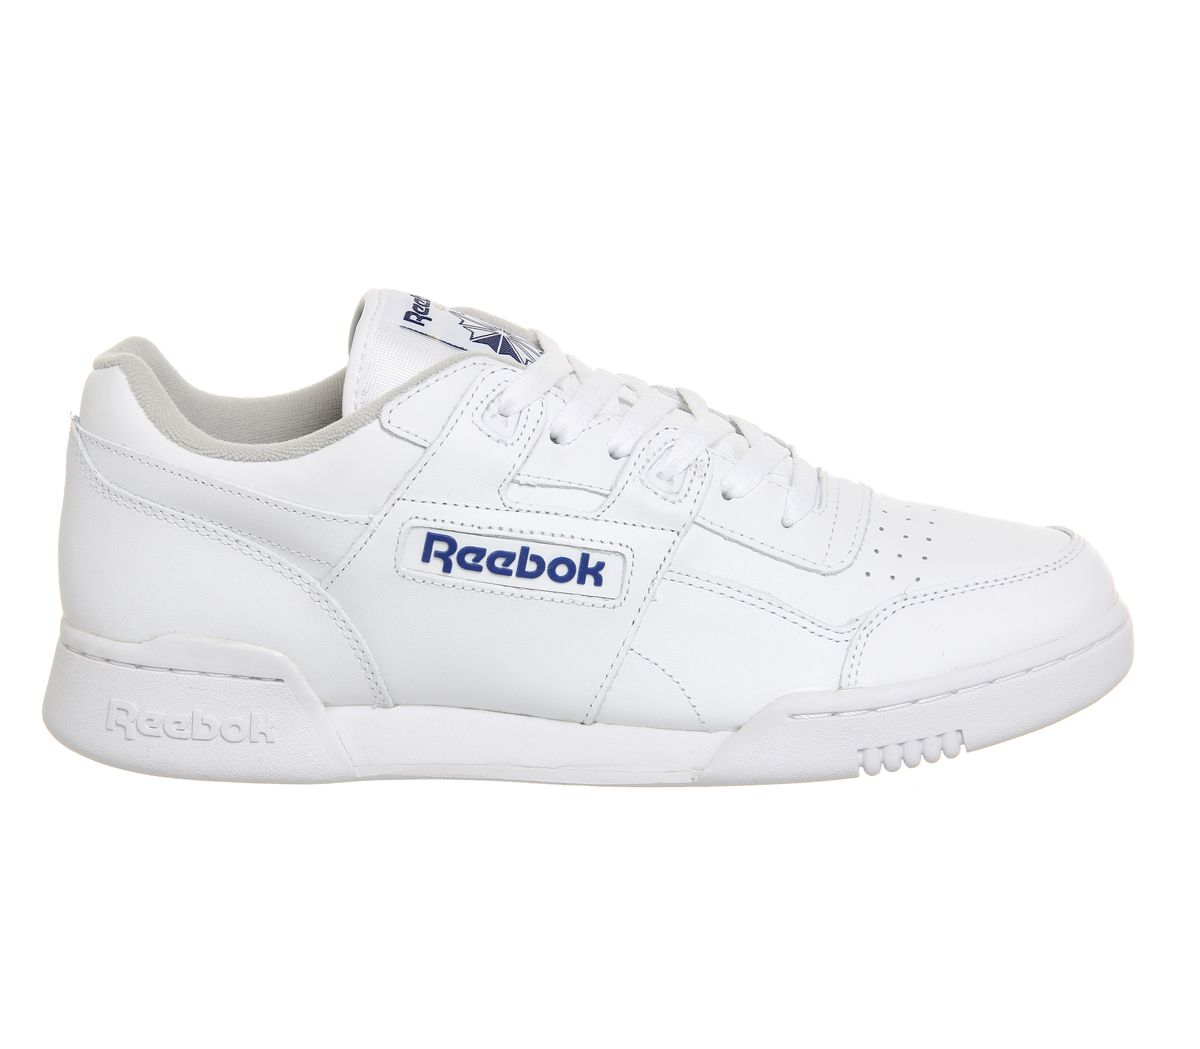 Reebok Workout Plus White Royal Trainers Shoes